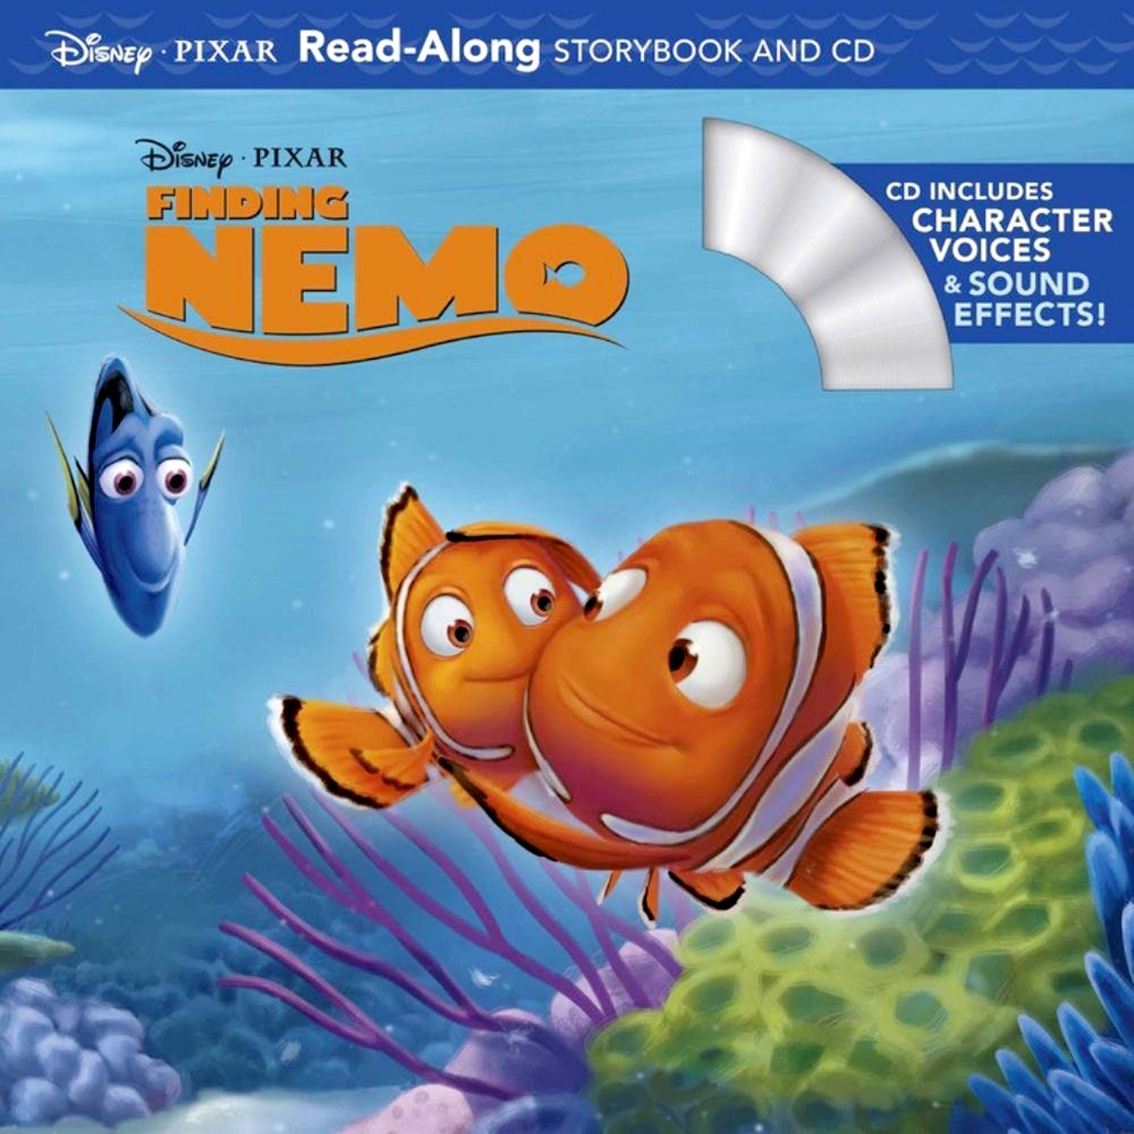 Disney Pixar Finding Nemo Read Along Storybook And Cd